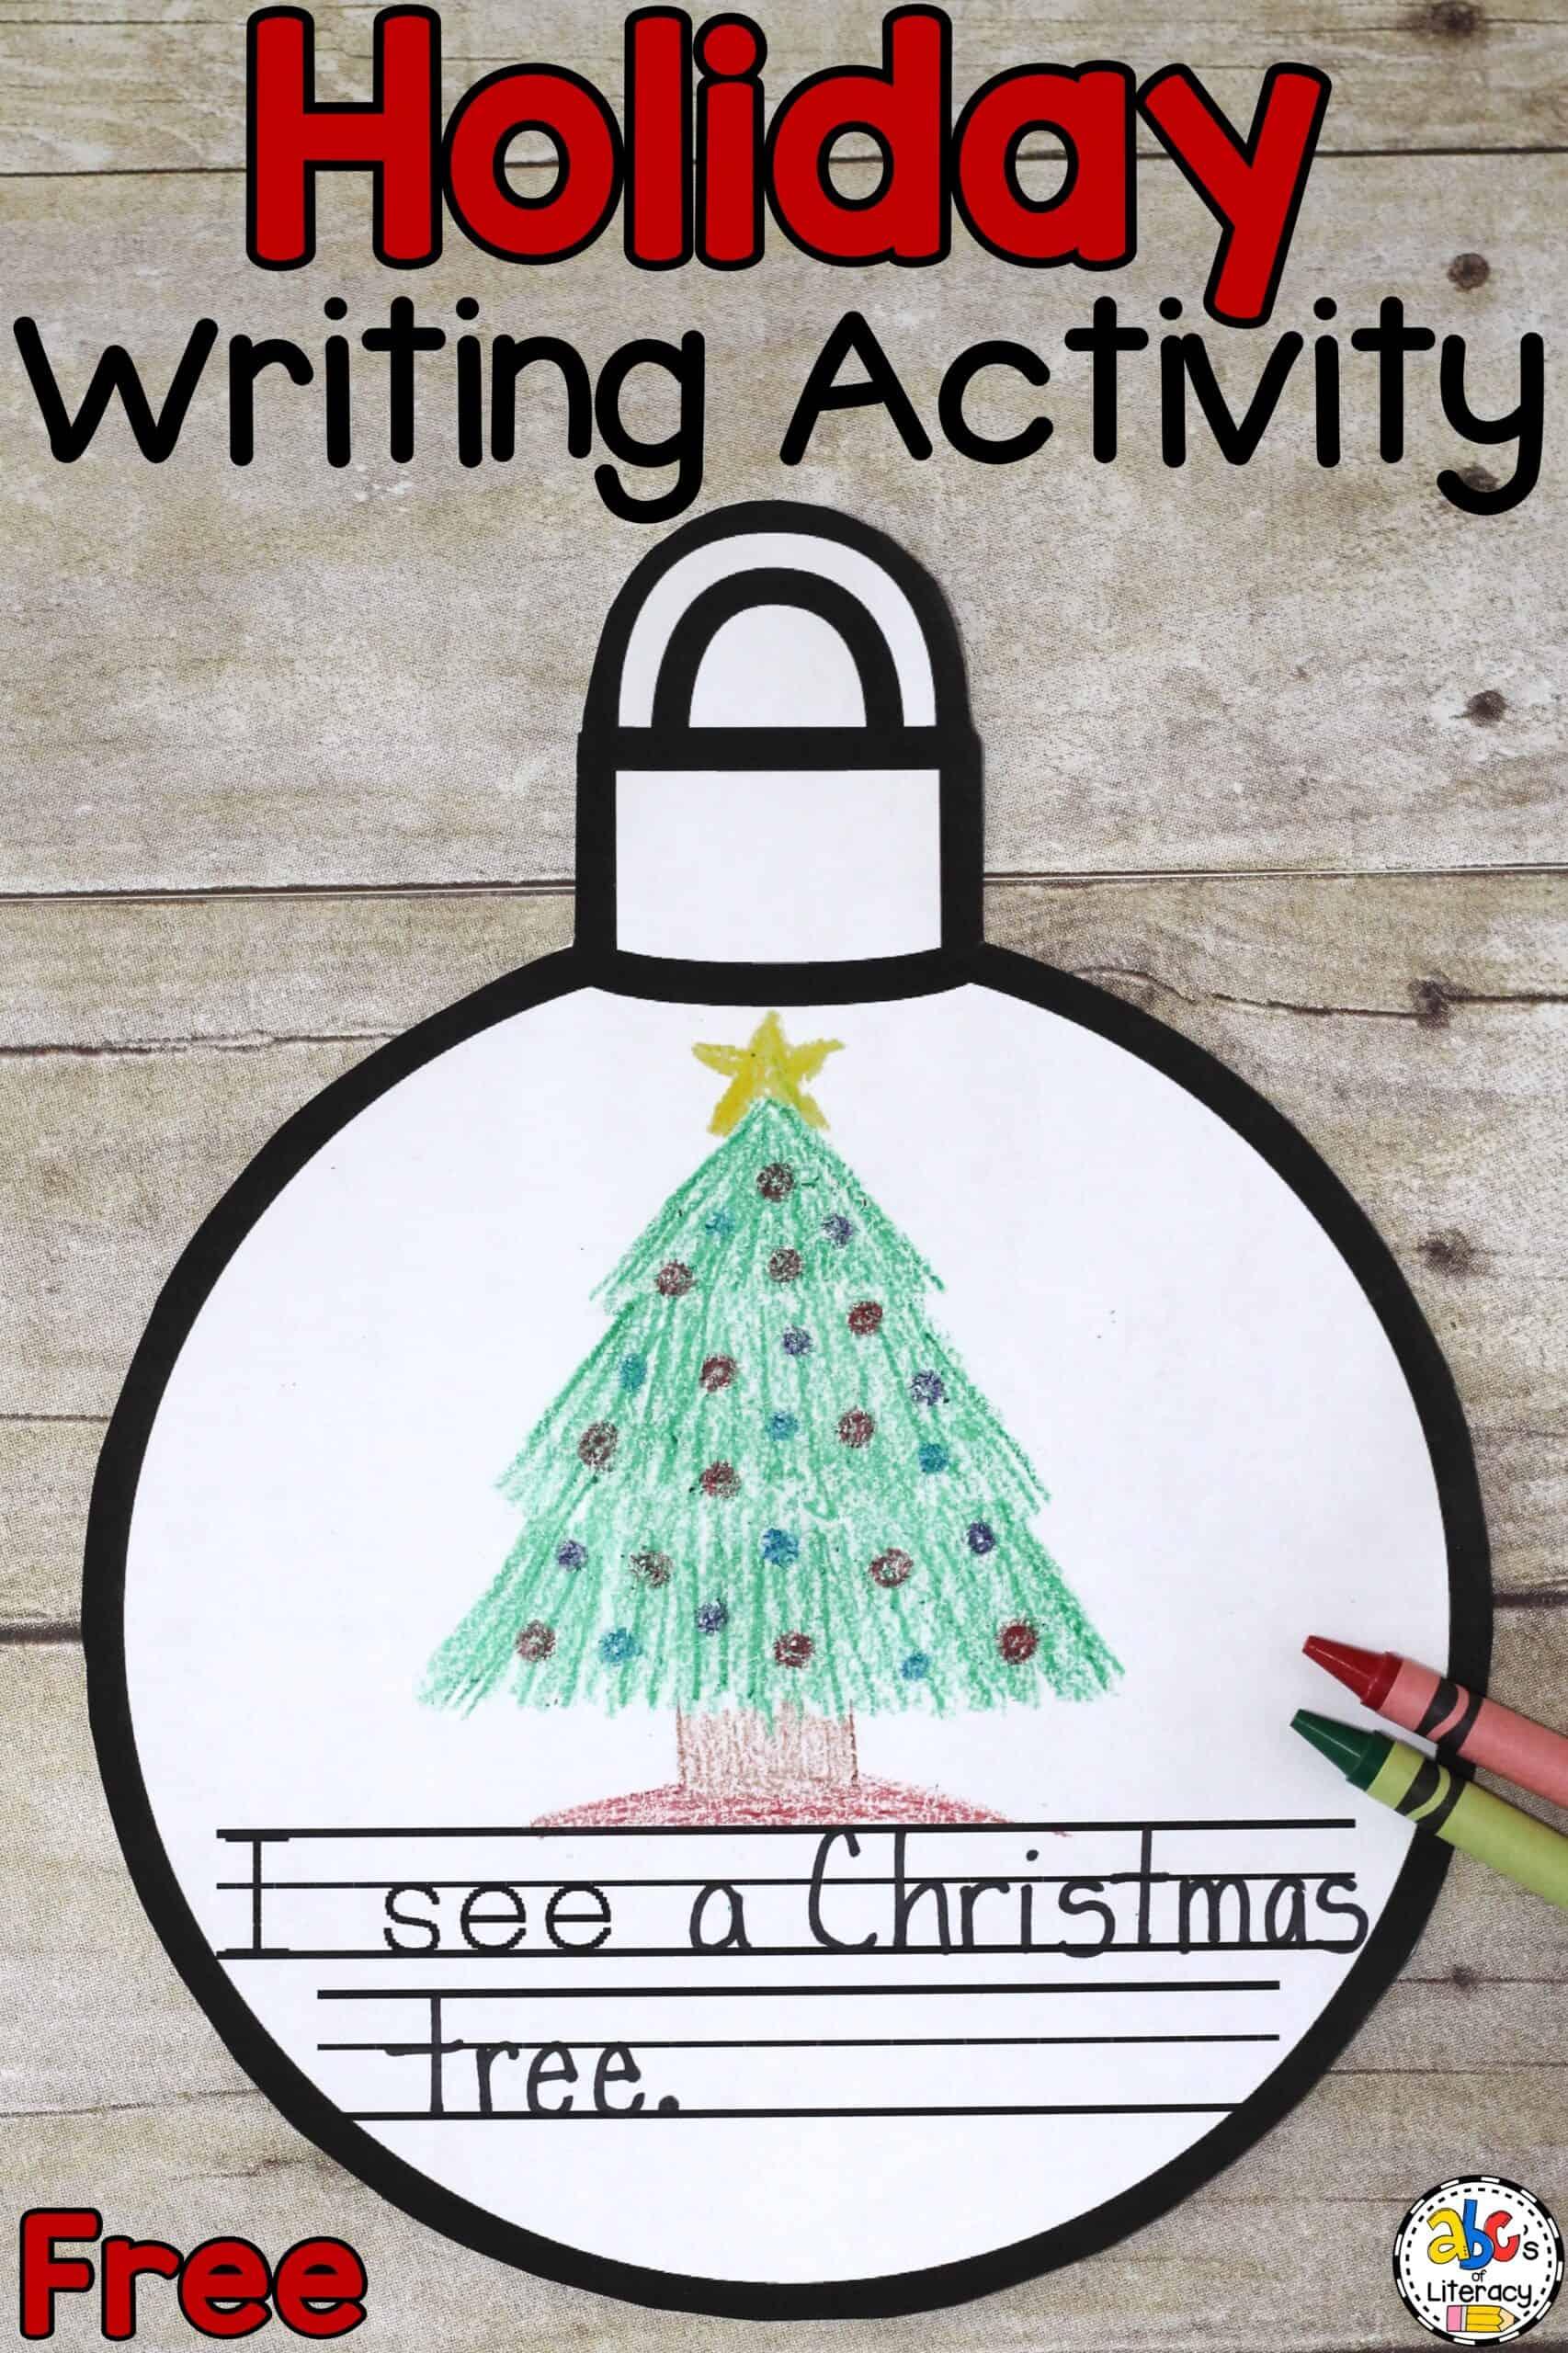 25 Days of Christmas Activities